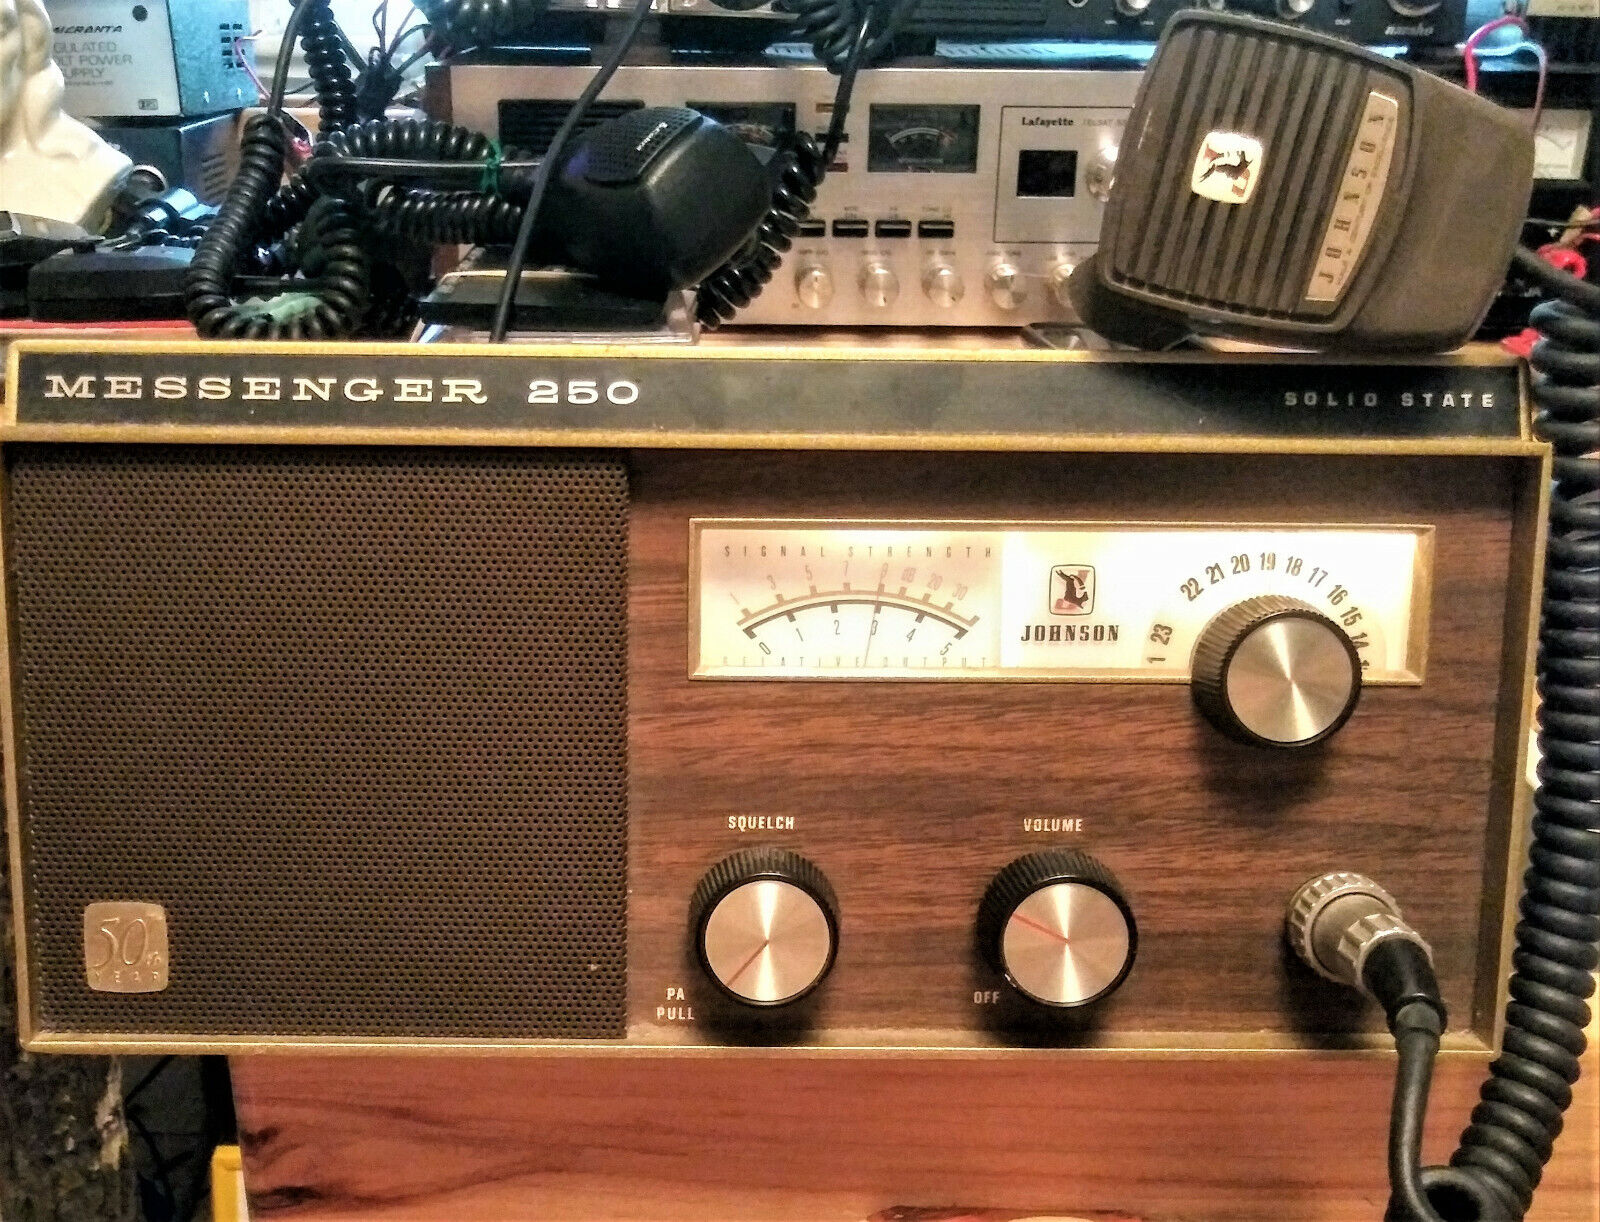 VINTAGE  JOHNSON MESSENGER 250  CB RADIO / BASE STATION   WORKING & TRANSMITTING. Buy it now for 349.99